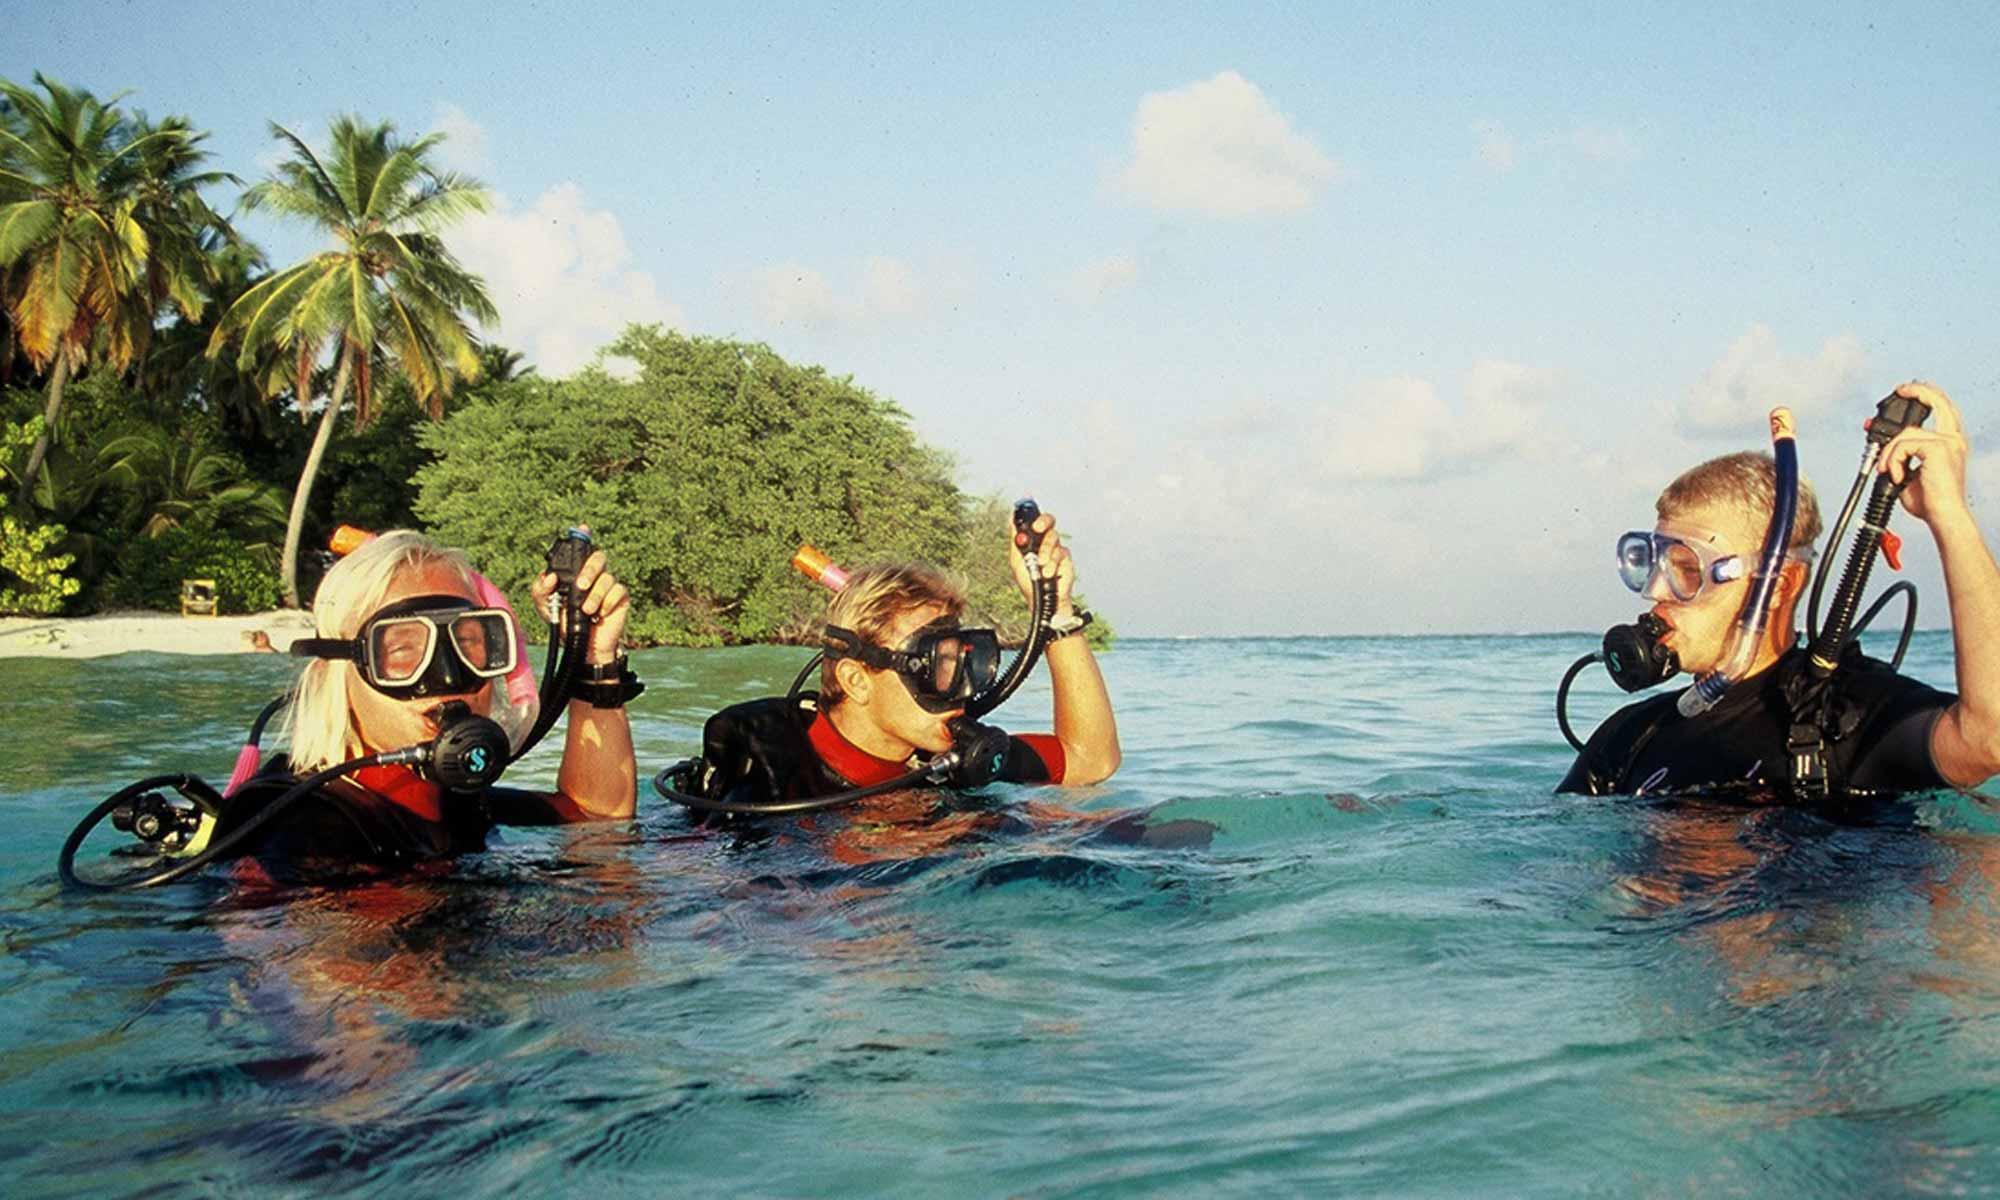 Slow Dive Indischer Ozean Malediven Euro Divers Vilamendhoo Abtauchen